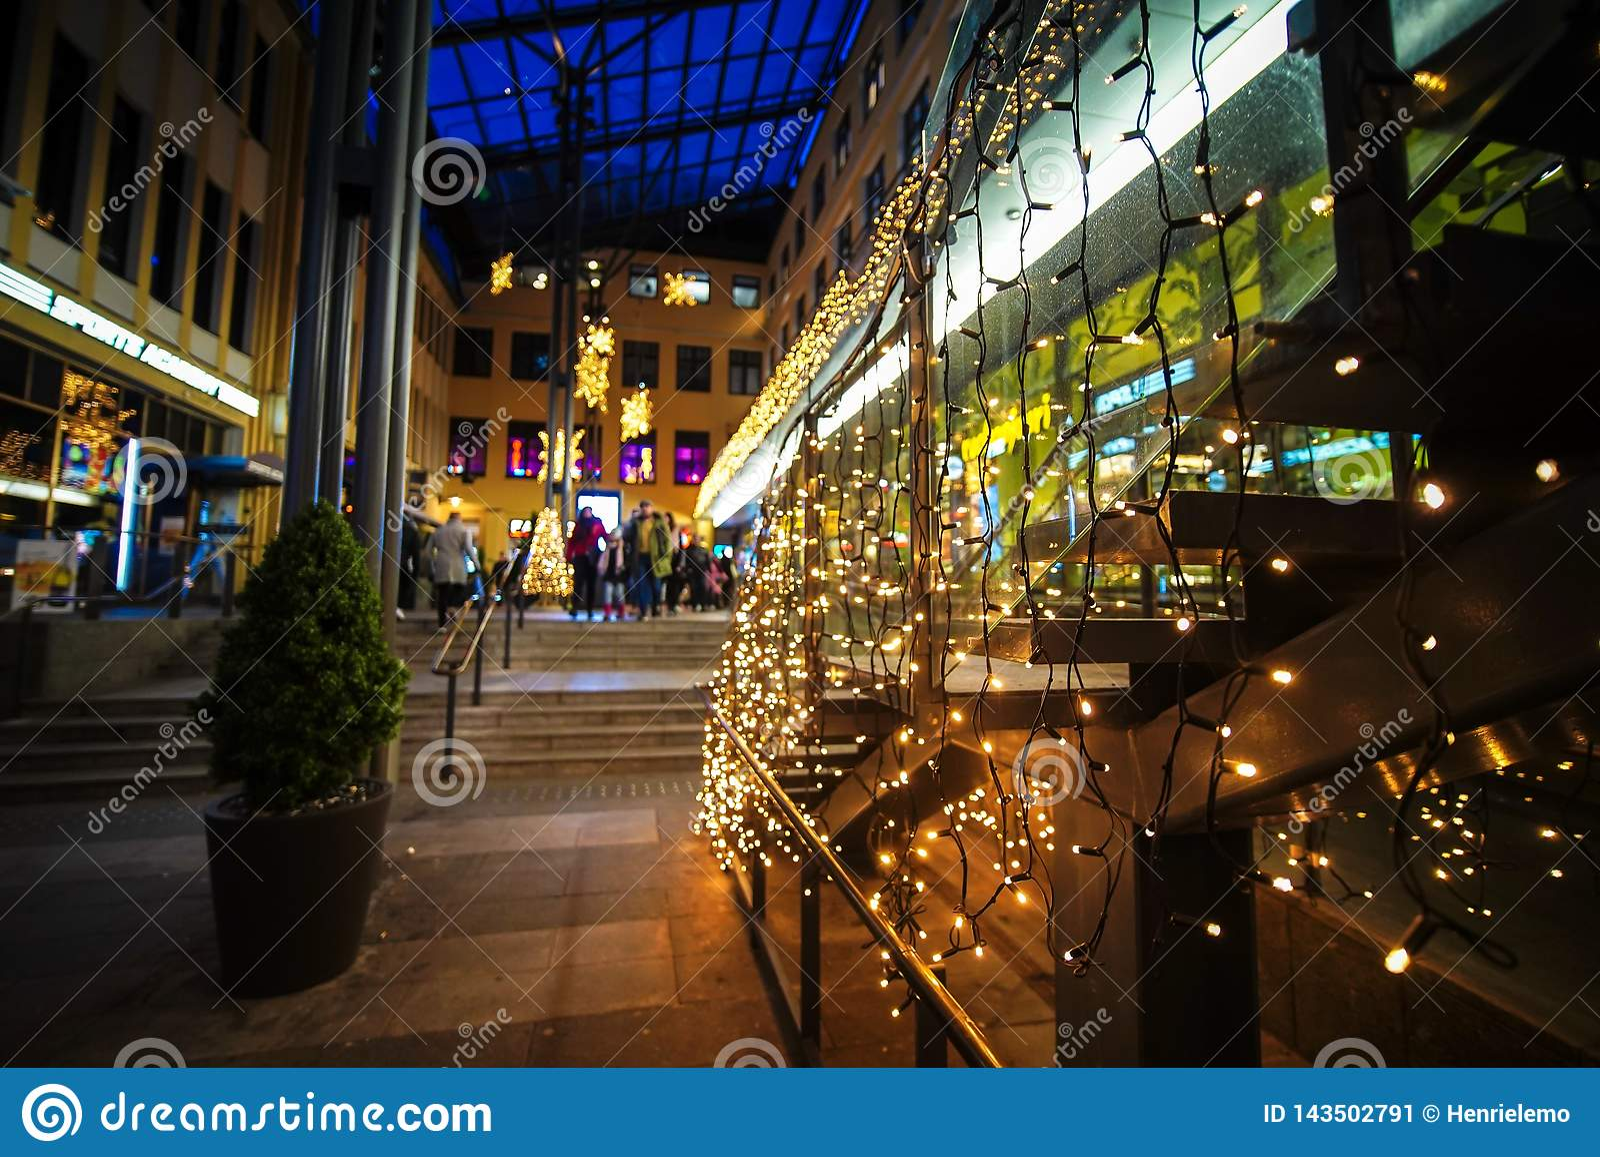 Helsinki, Finland - November 25, 2018: Shopping street on evening in middle of Helsinki with seasonal Christmas Lights